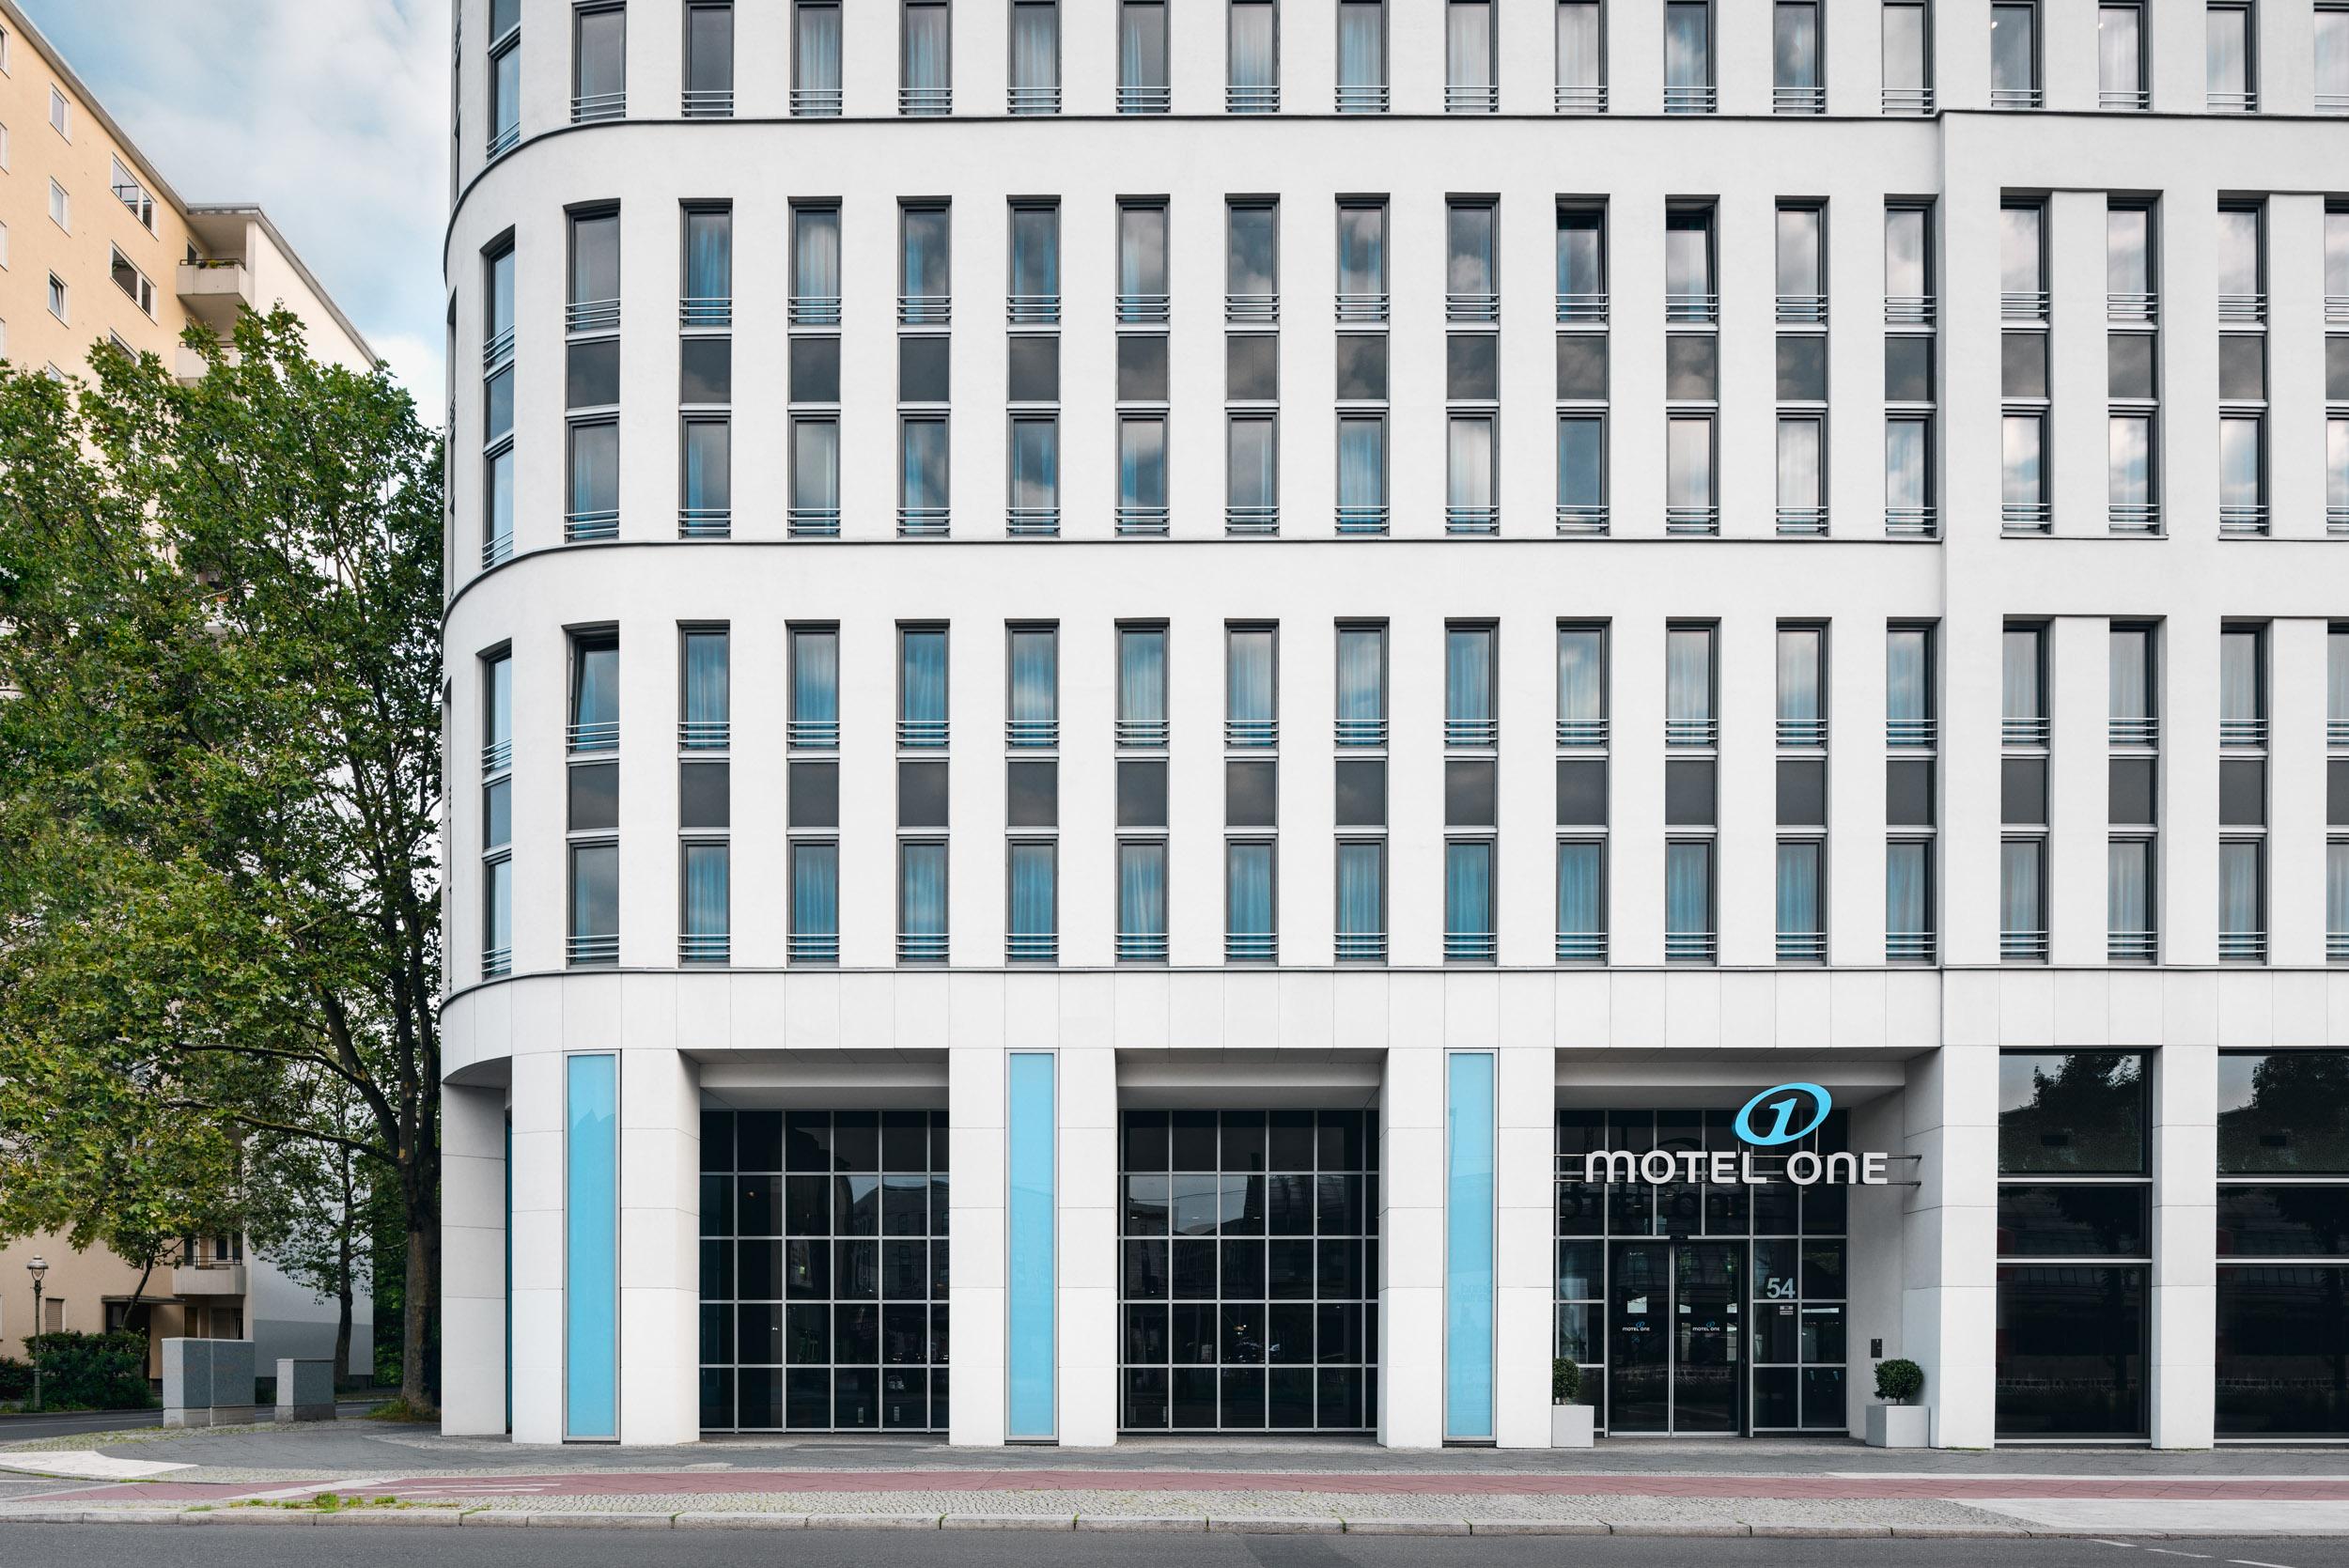 Gustav-Epple-Bauunternehmung-Motel-One-Berlin-HBF-MLX6331